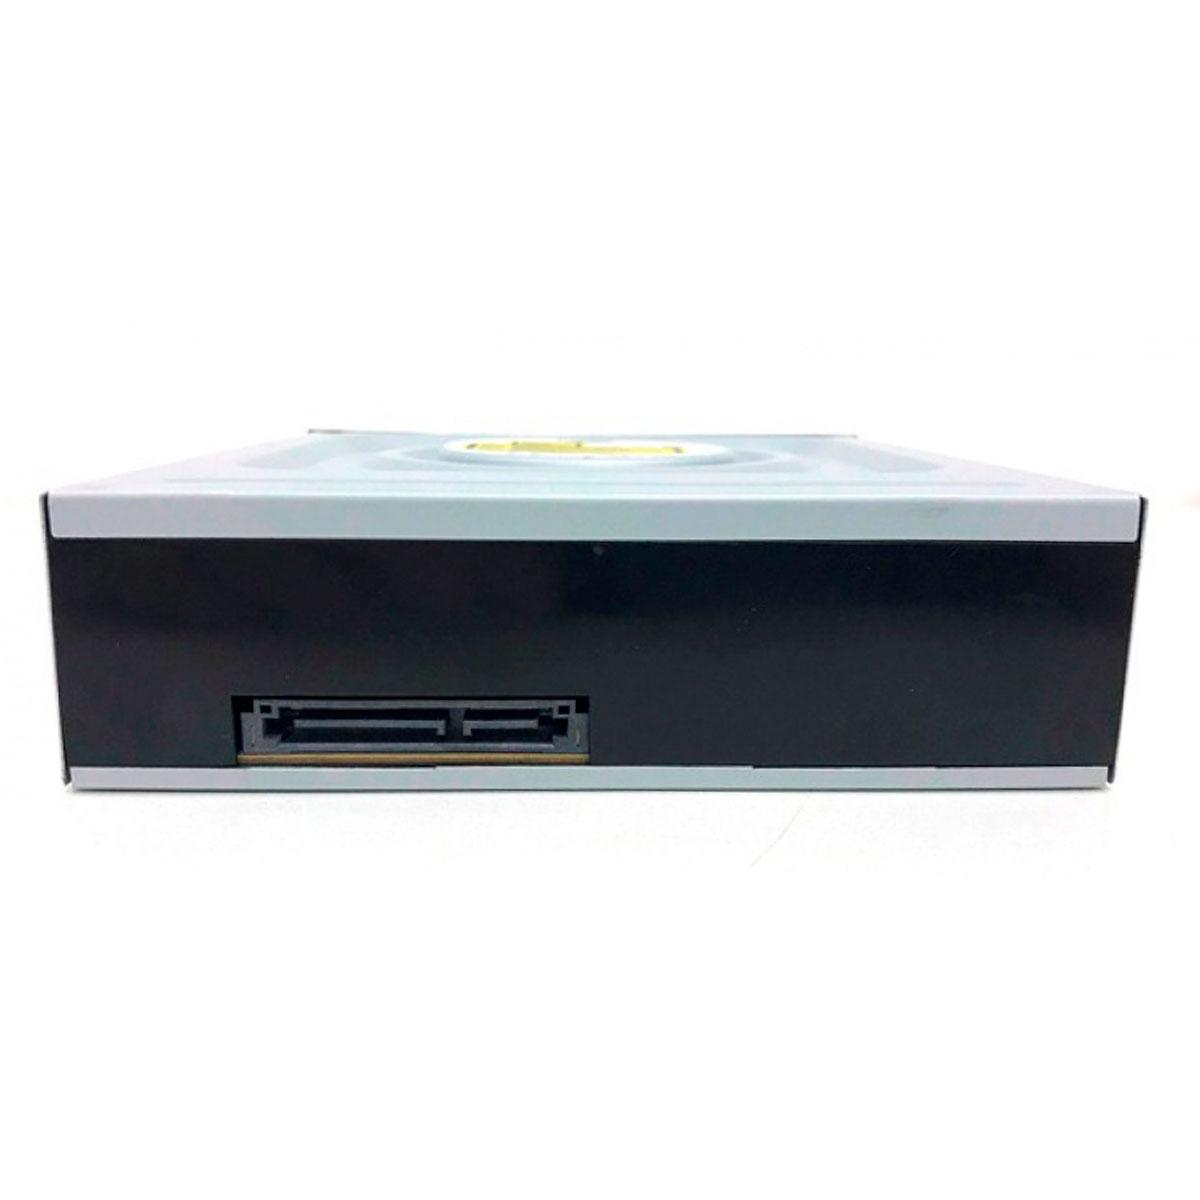 "Gravador DVD DEX DG-200 SATA, 5.25"""